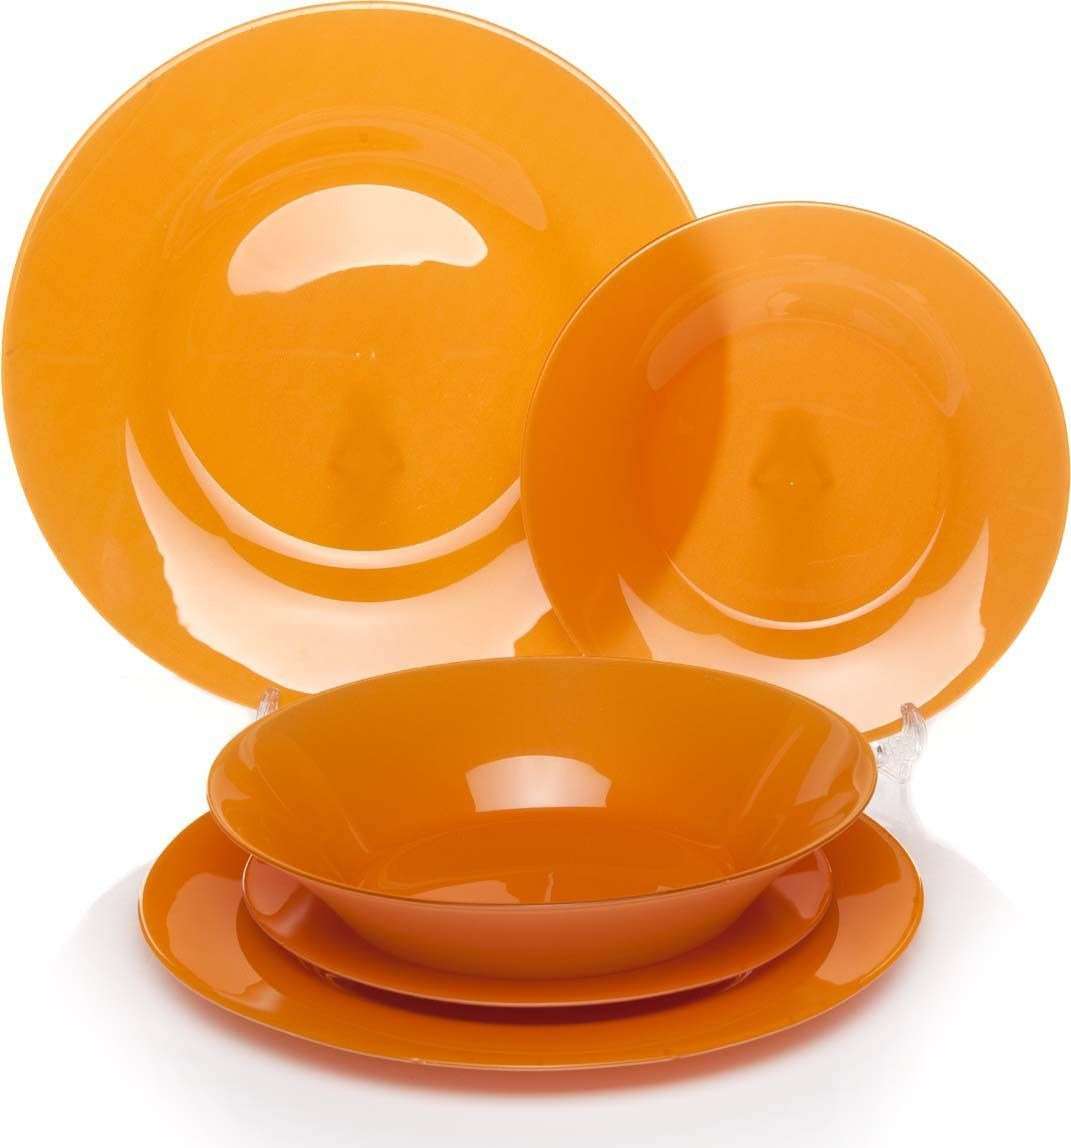 Набор тарелок Pasabahce Уоркшоп Оранж Виллаж, 18 предметов тарелки